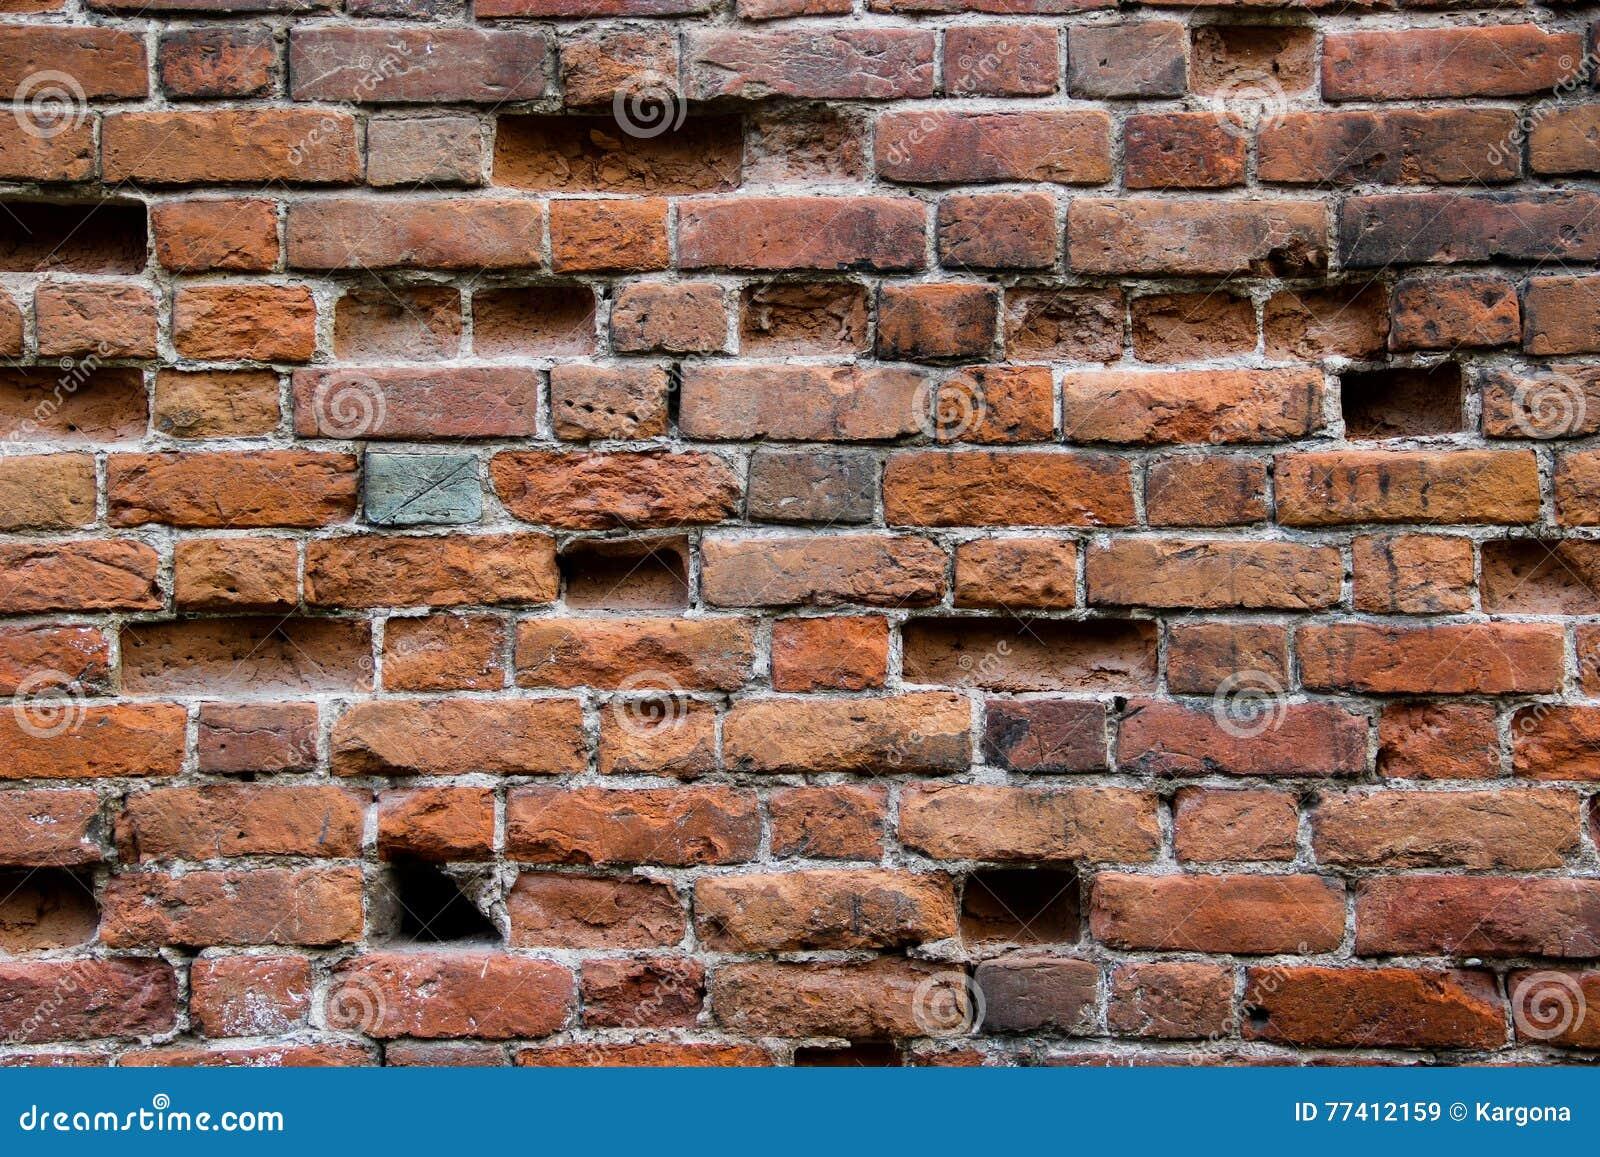 Old Damaged Brick Wall With Holes Stock Image Image